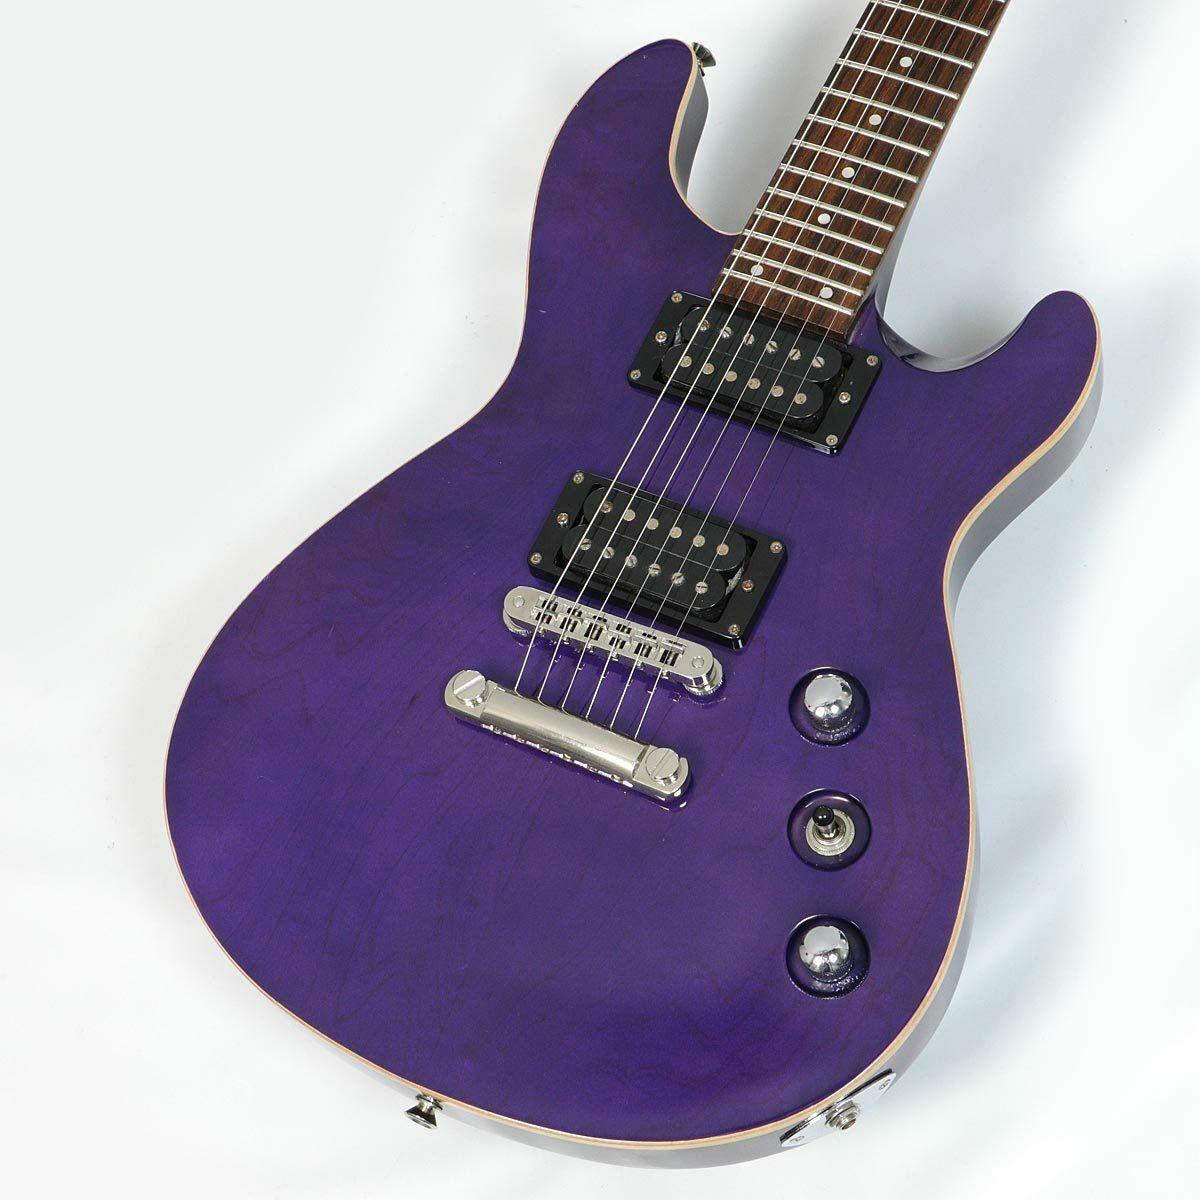 Burny APG STD STP electric guitar Japan rare beautiful vintage popular EMS F   S